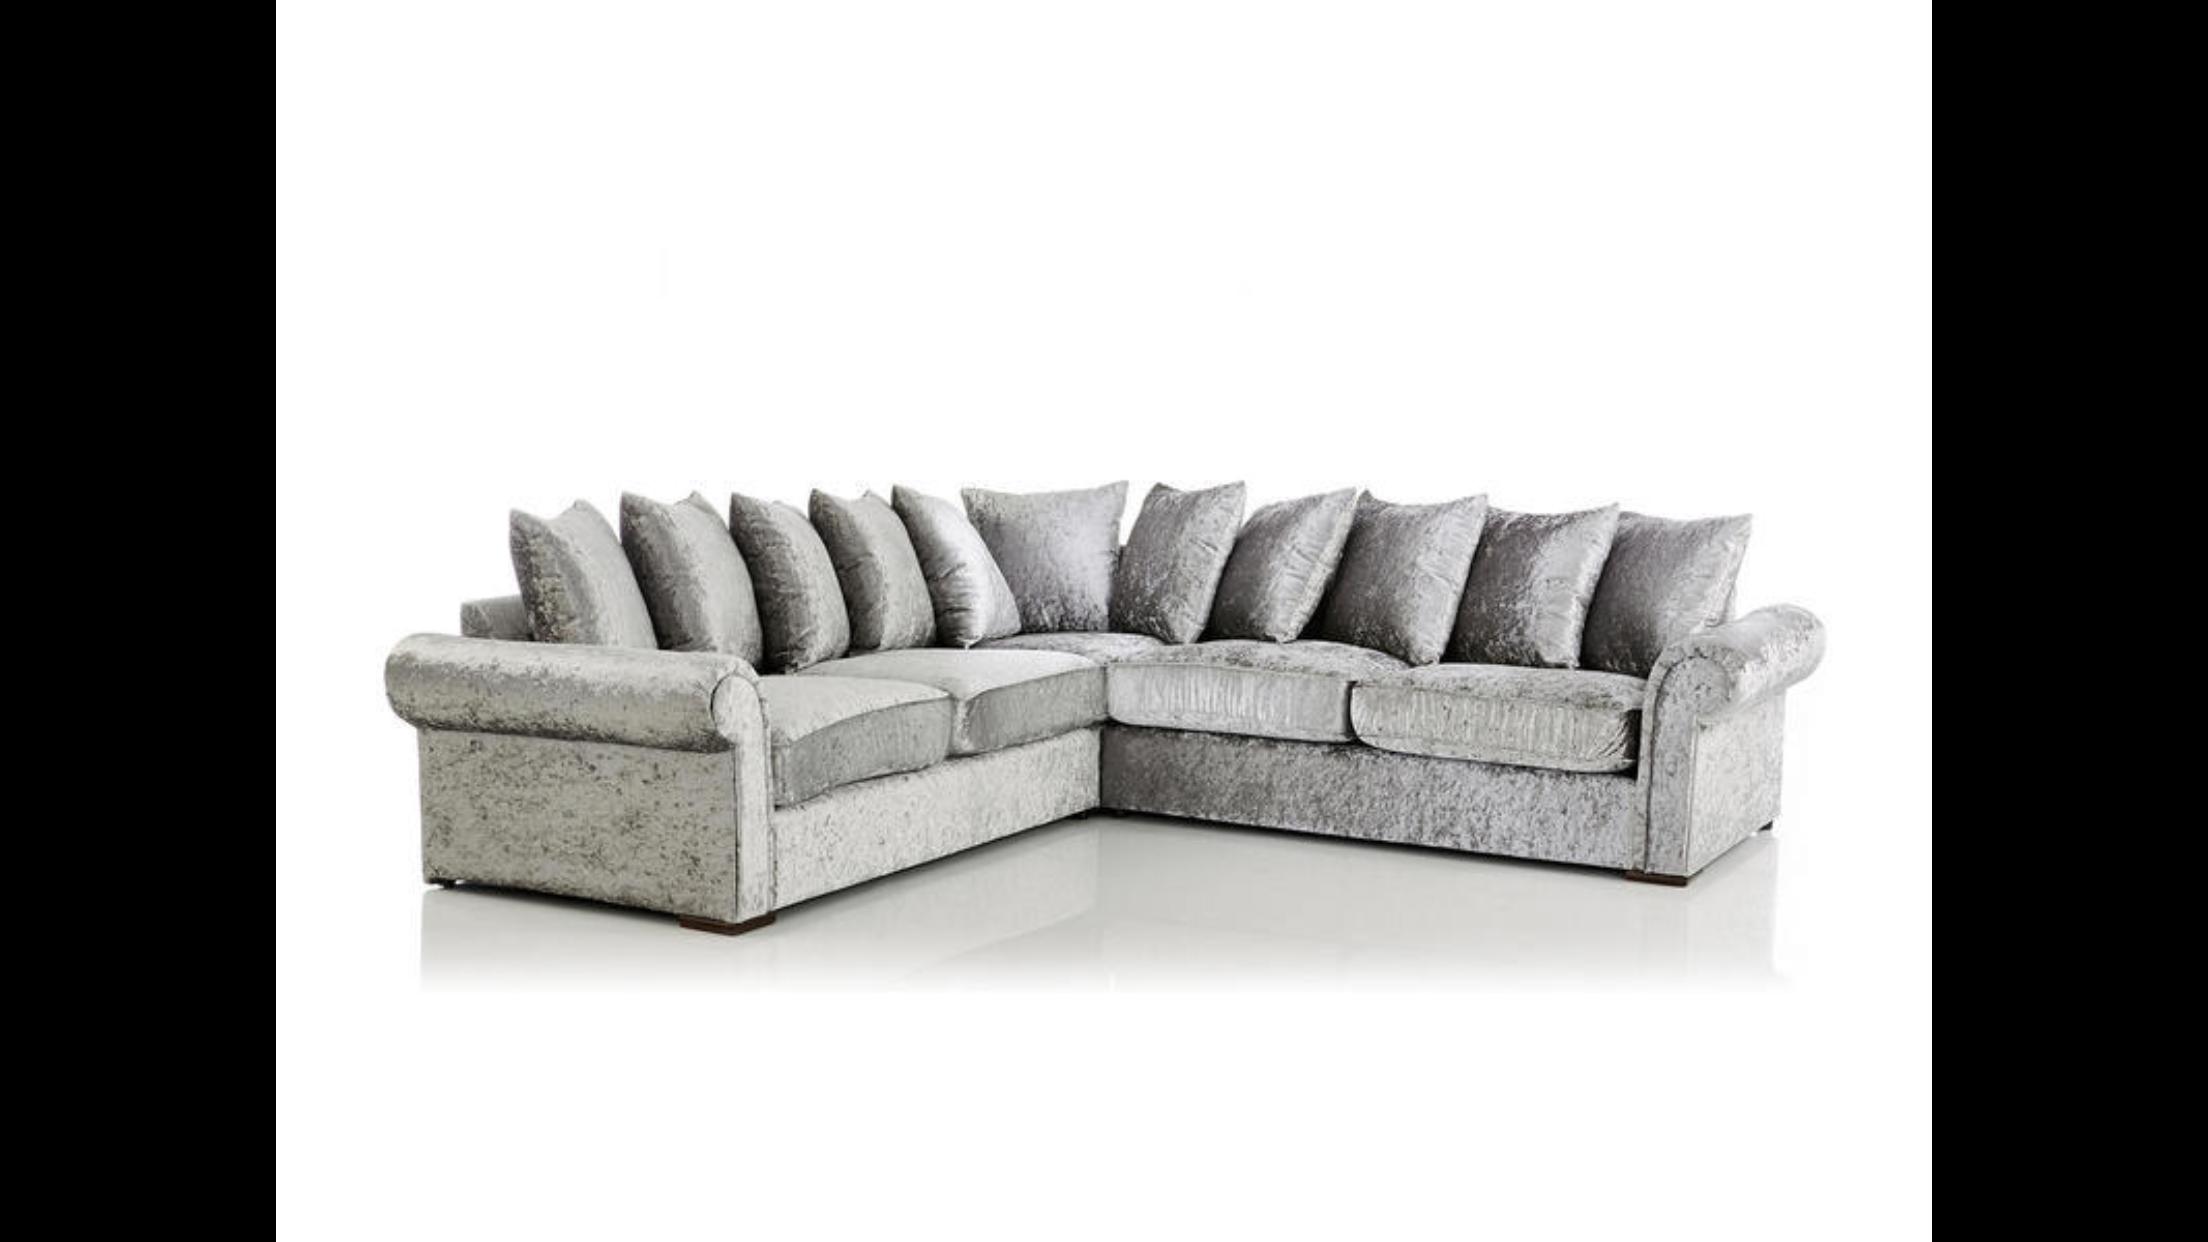 velvet teal, pink & grey sofa - Google Search | Extension ...